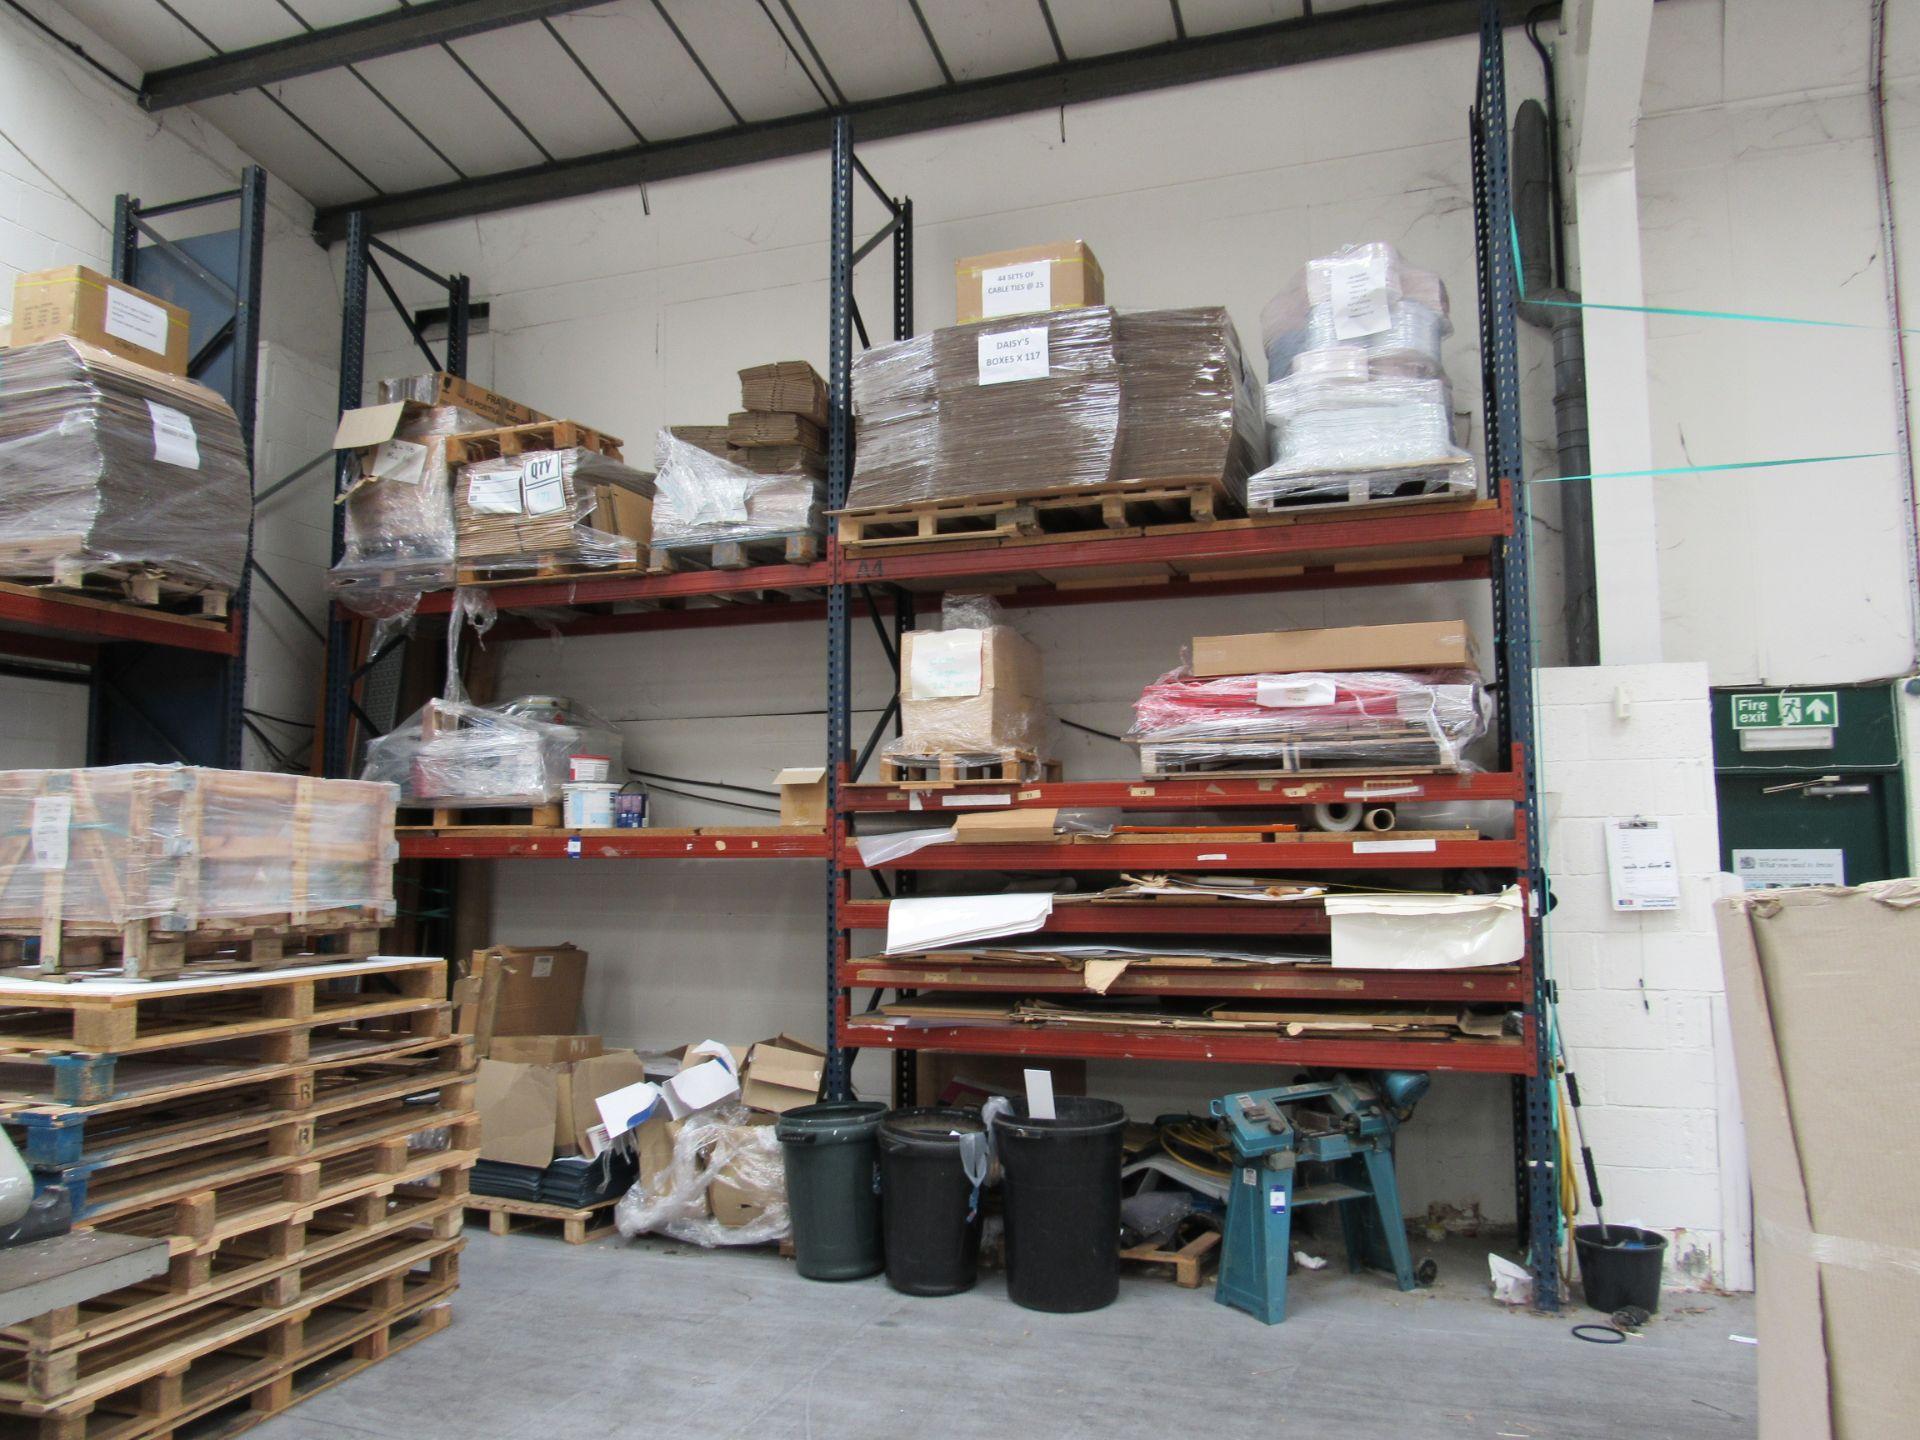 3 Bays Warehouse Racking, 5 End Frames, 20 Cross Beams - Image 2 of 3